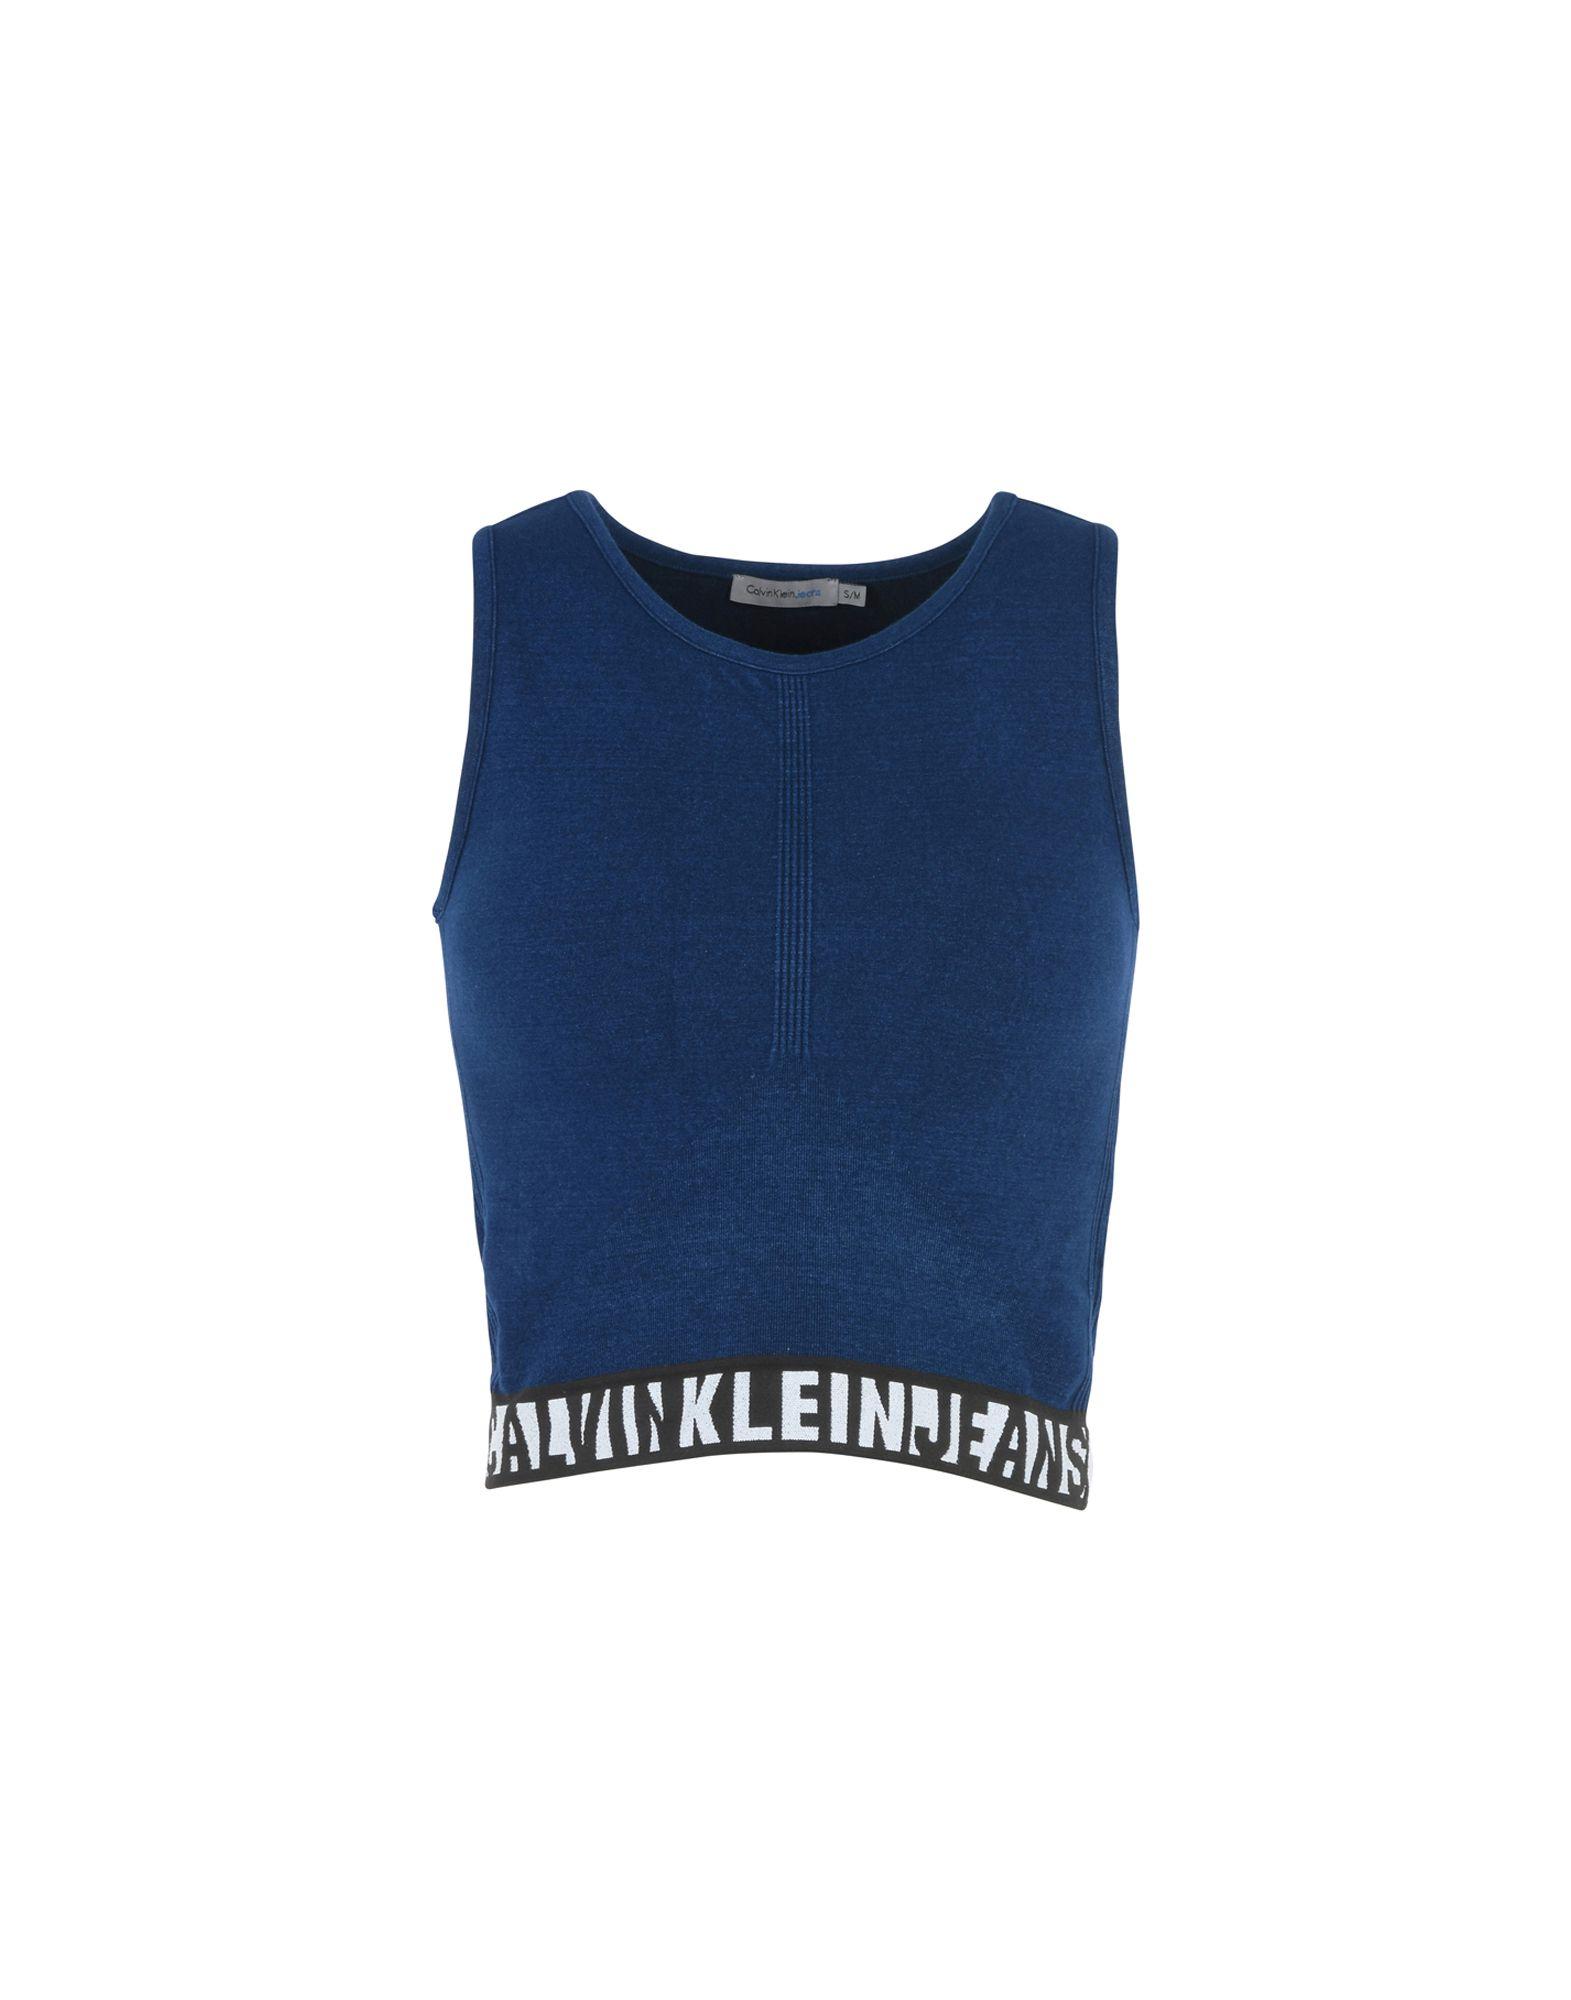 CALVIN KLEIN JEANS Топ без рукавов calvin klein jeans топ с принтом